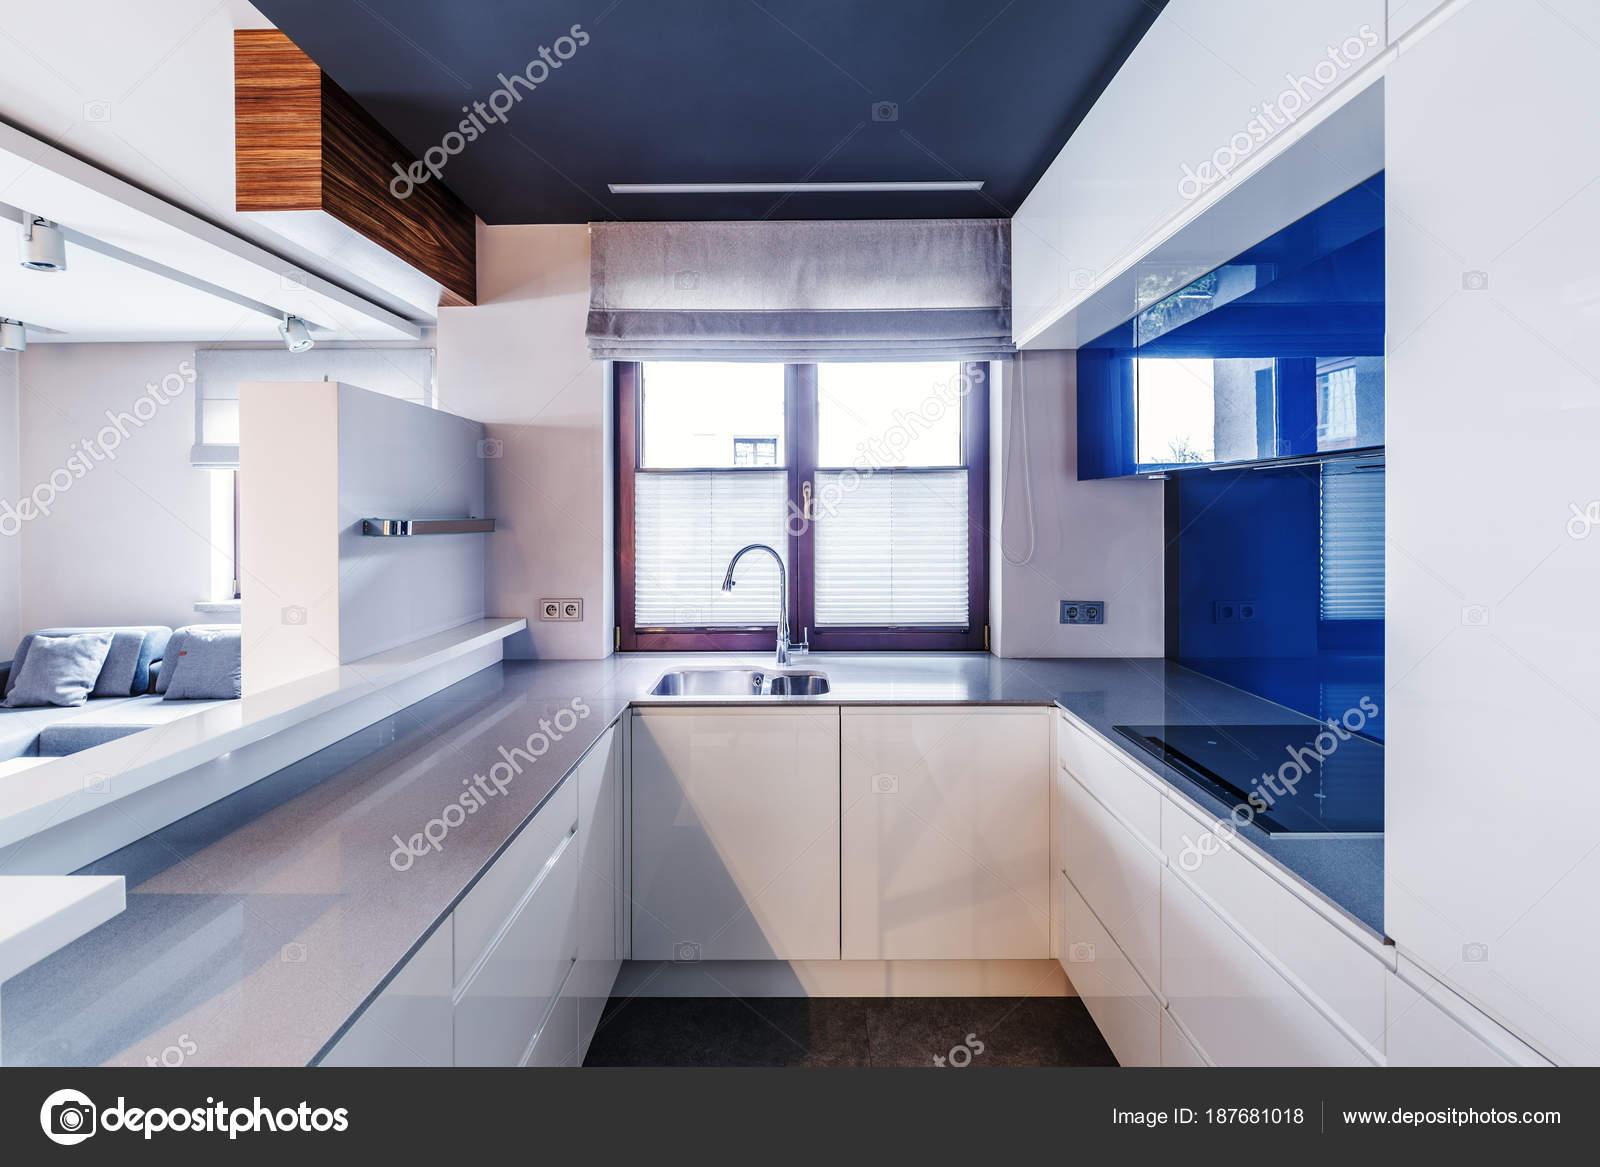 Moderne Blauw Keuken : Wit en blauw moderne keuken u2014 stockfoto © photographee.eu #187681018